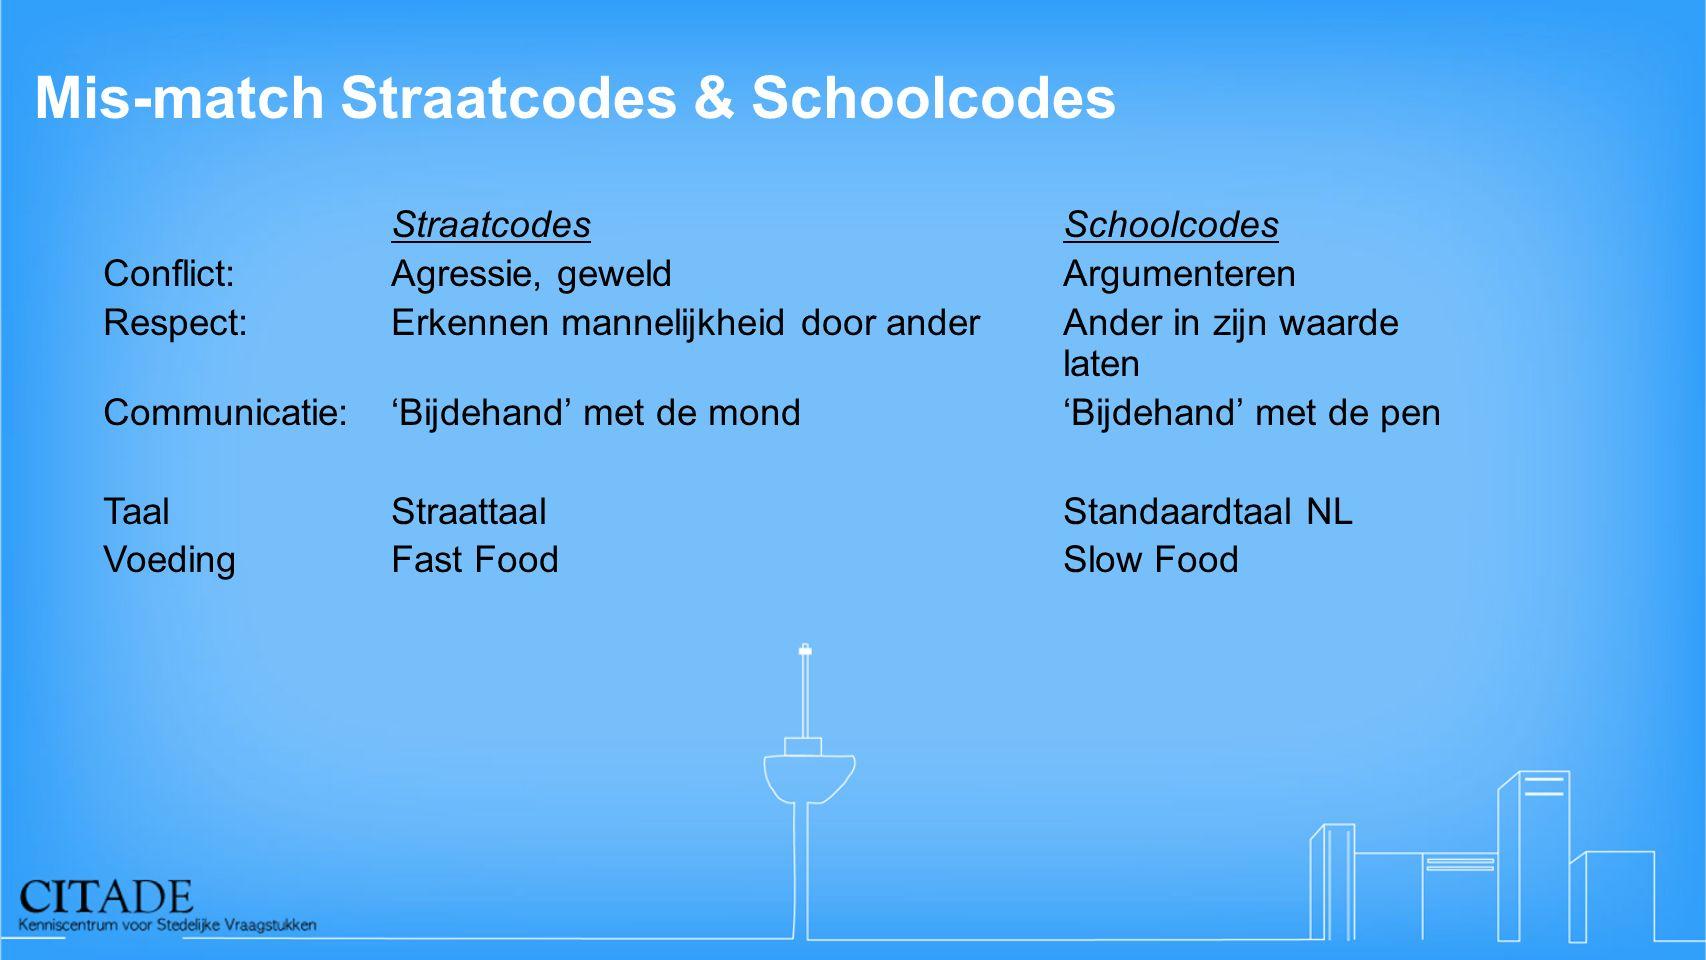 Mis-match Straatcodes & Schoolcodes